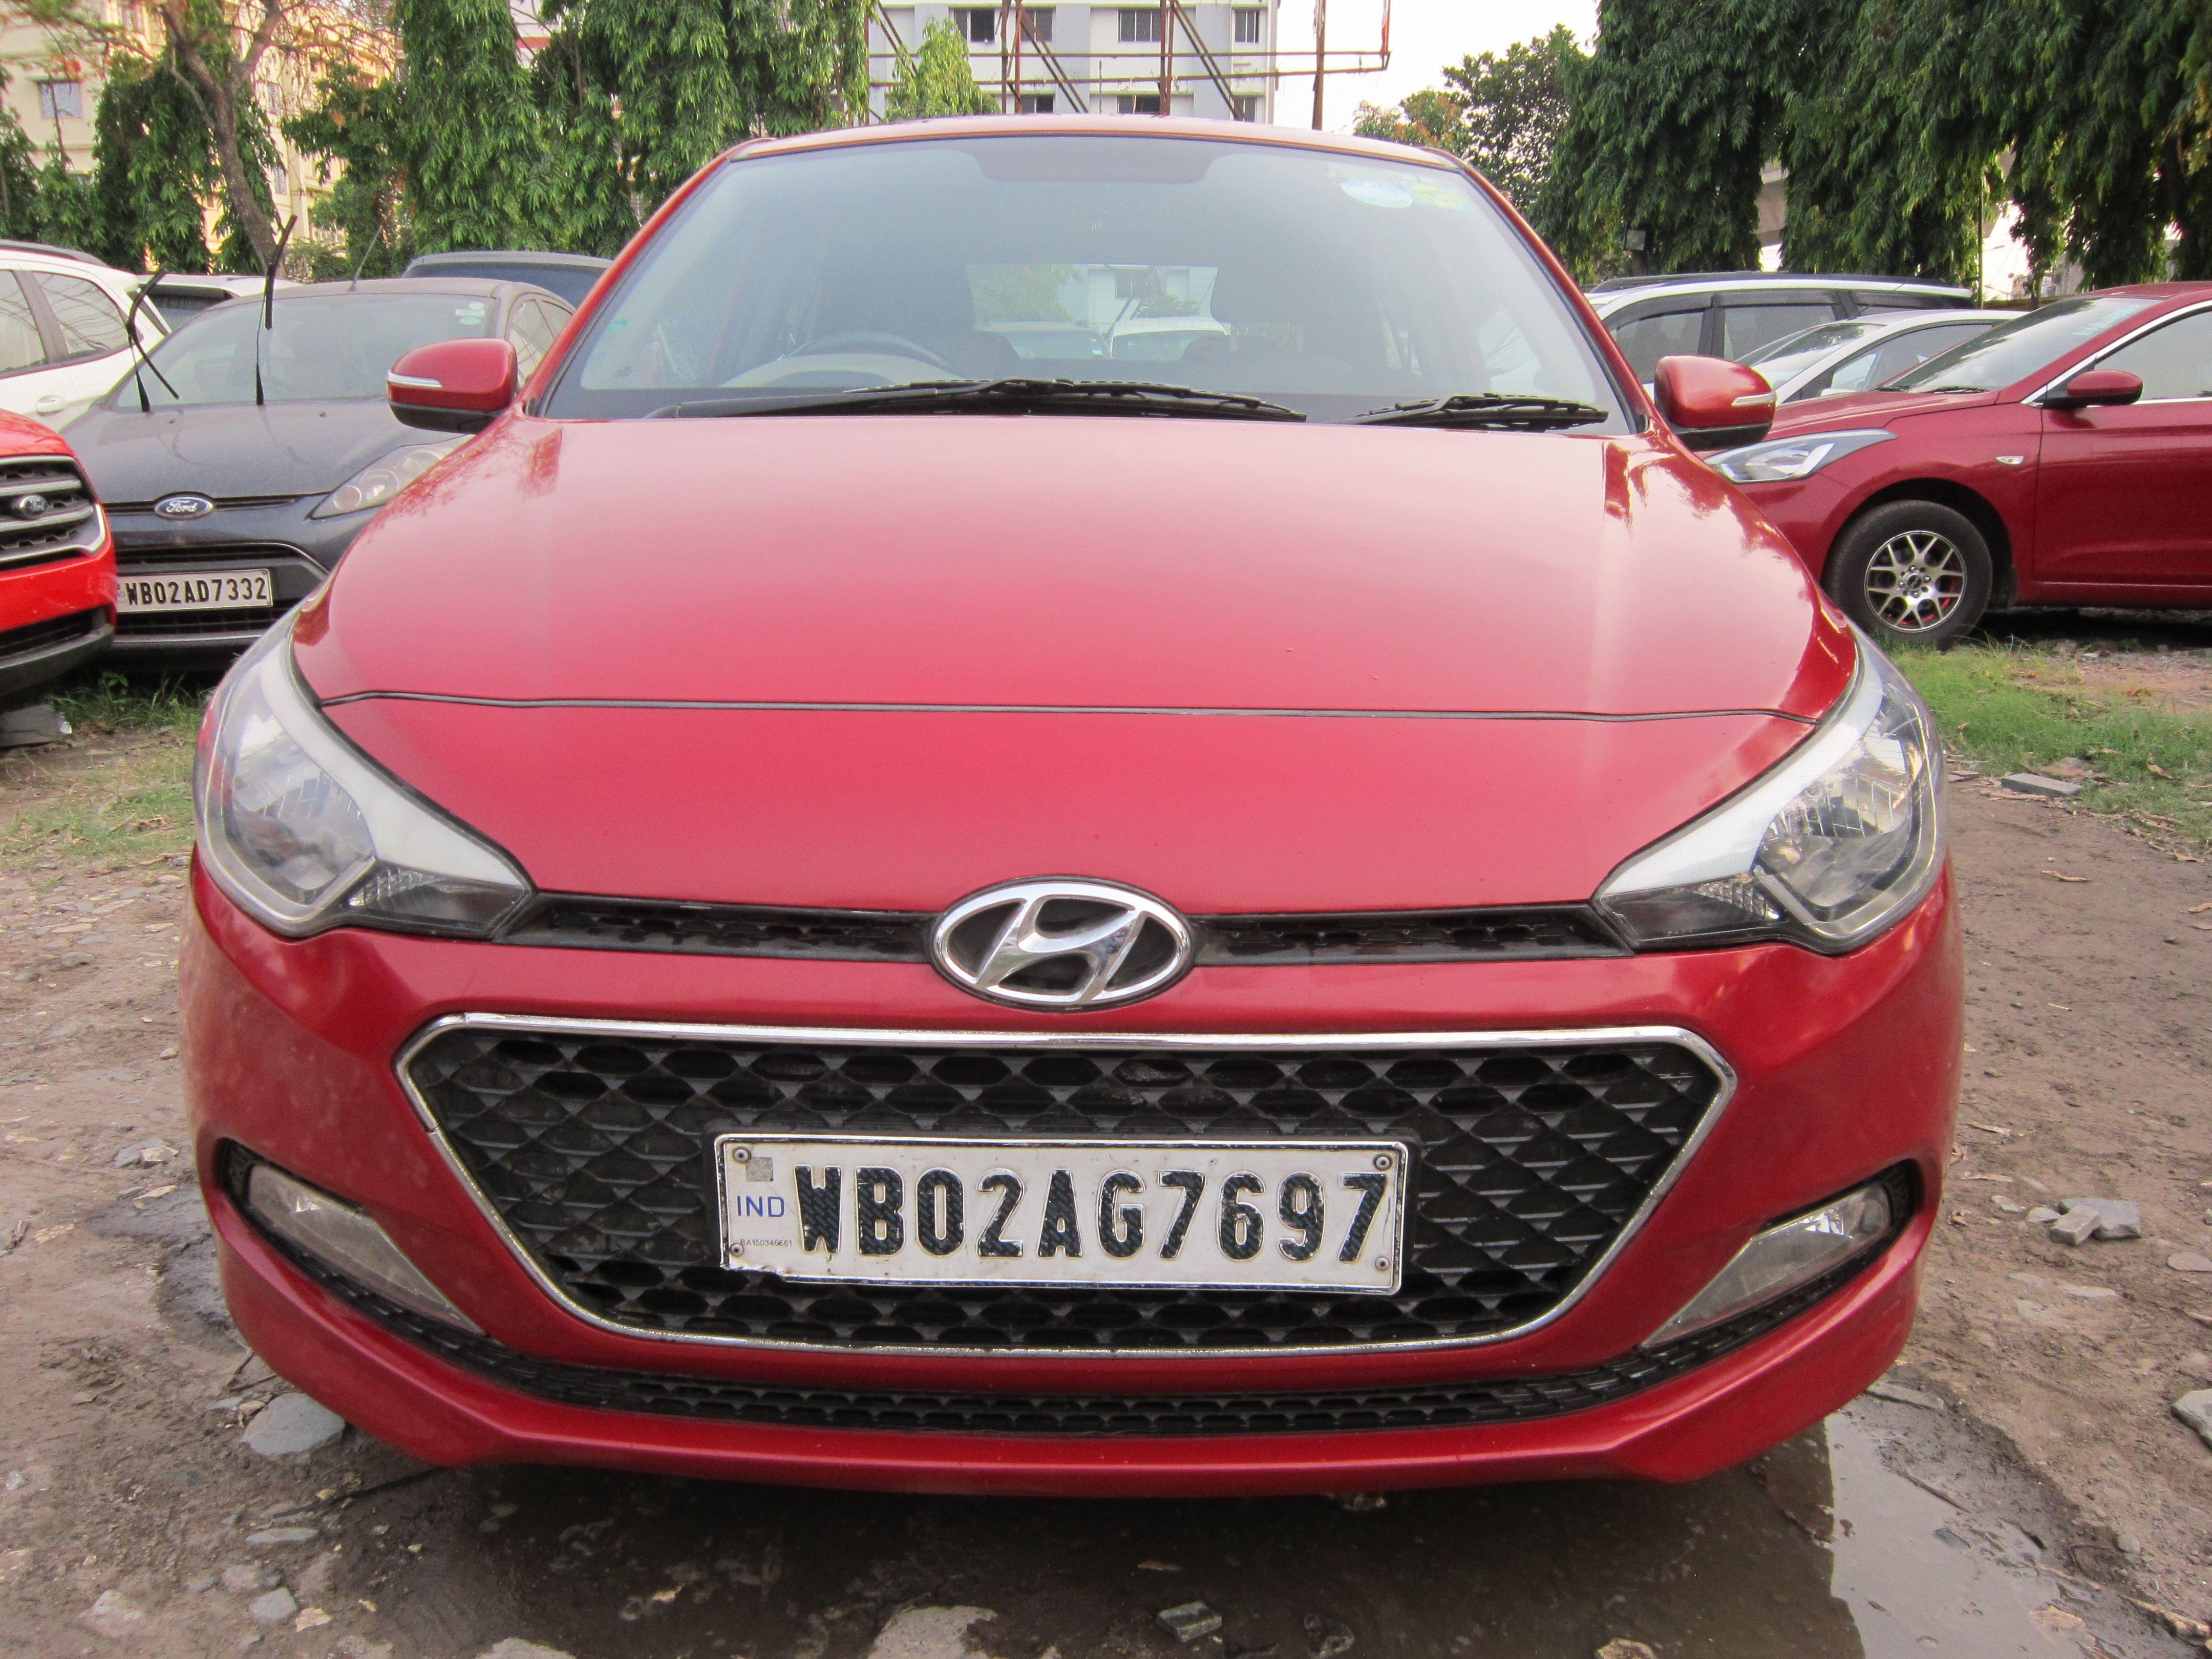 2015 Used Hyundai I20 SPORTZ 1.4 CRDI 6 SPEED BS IV